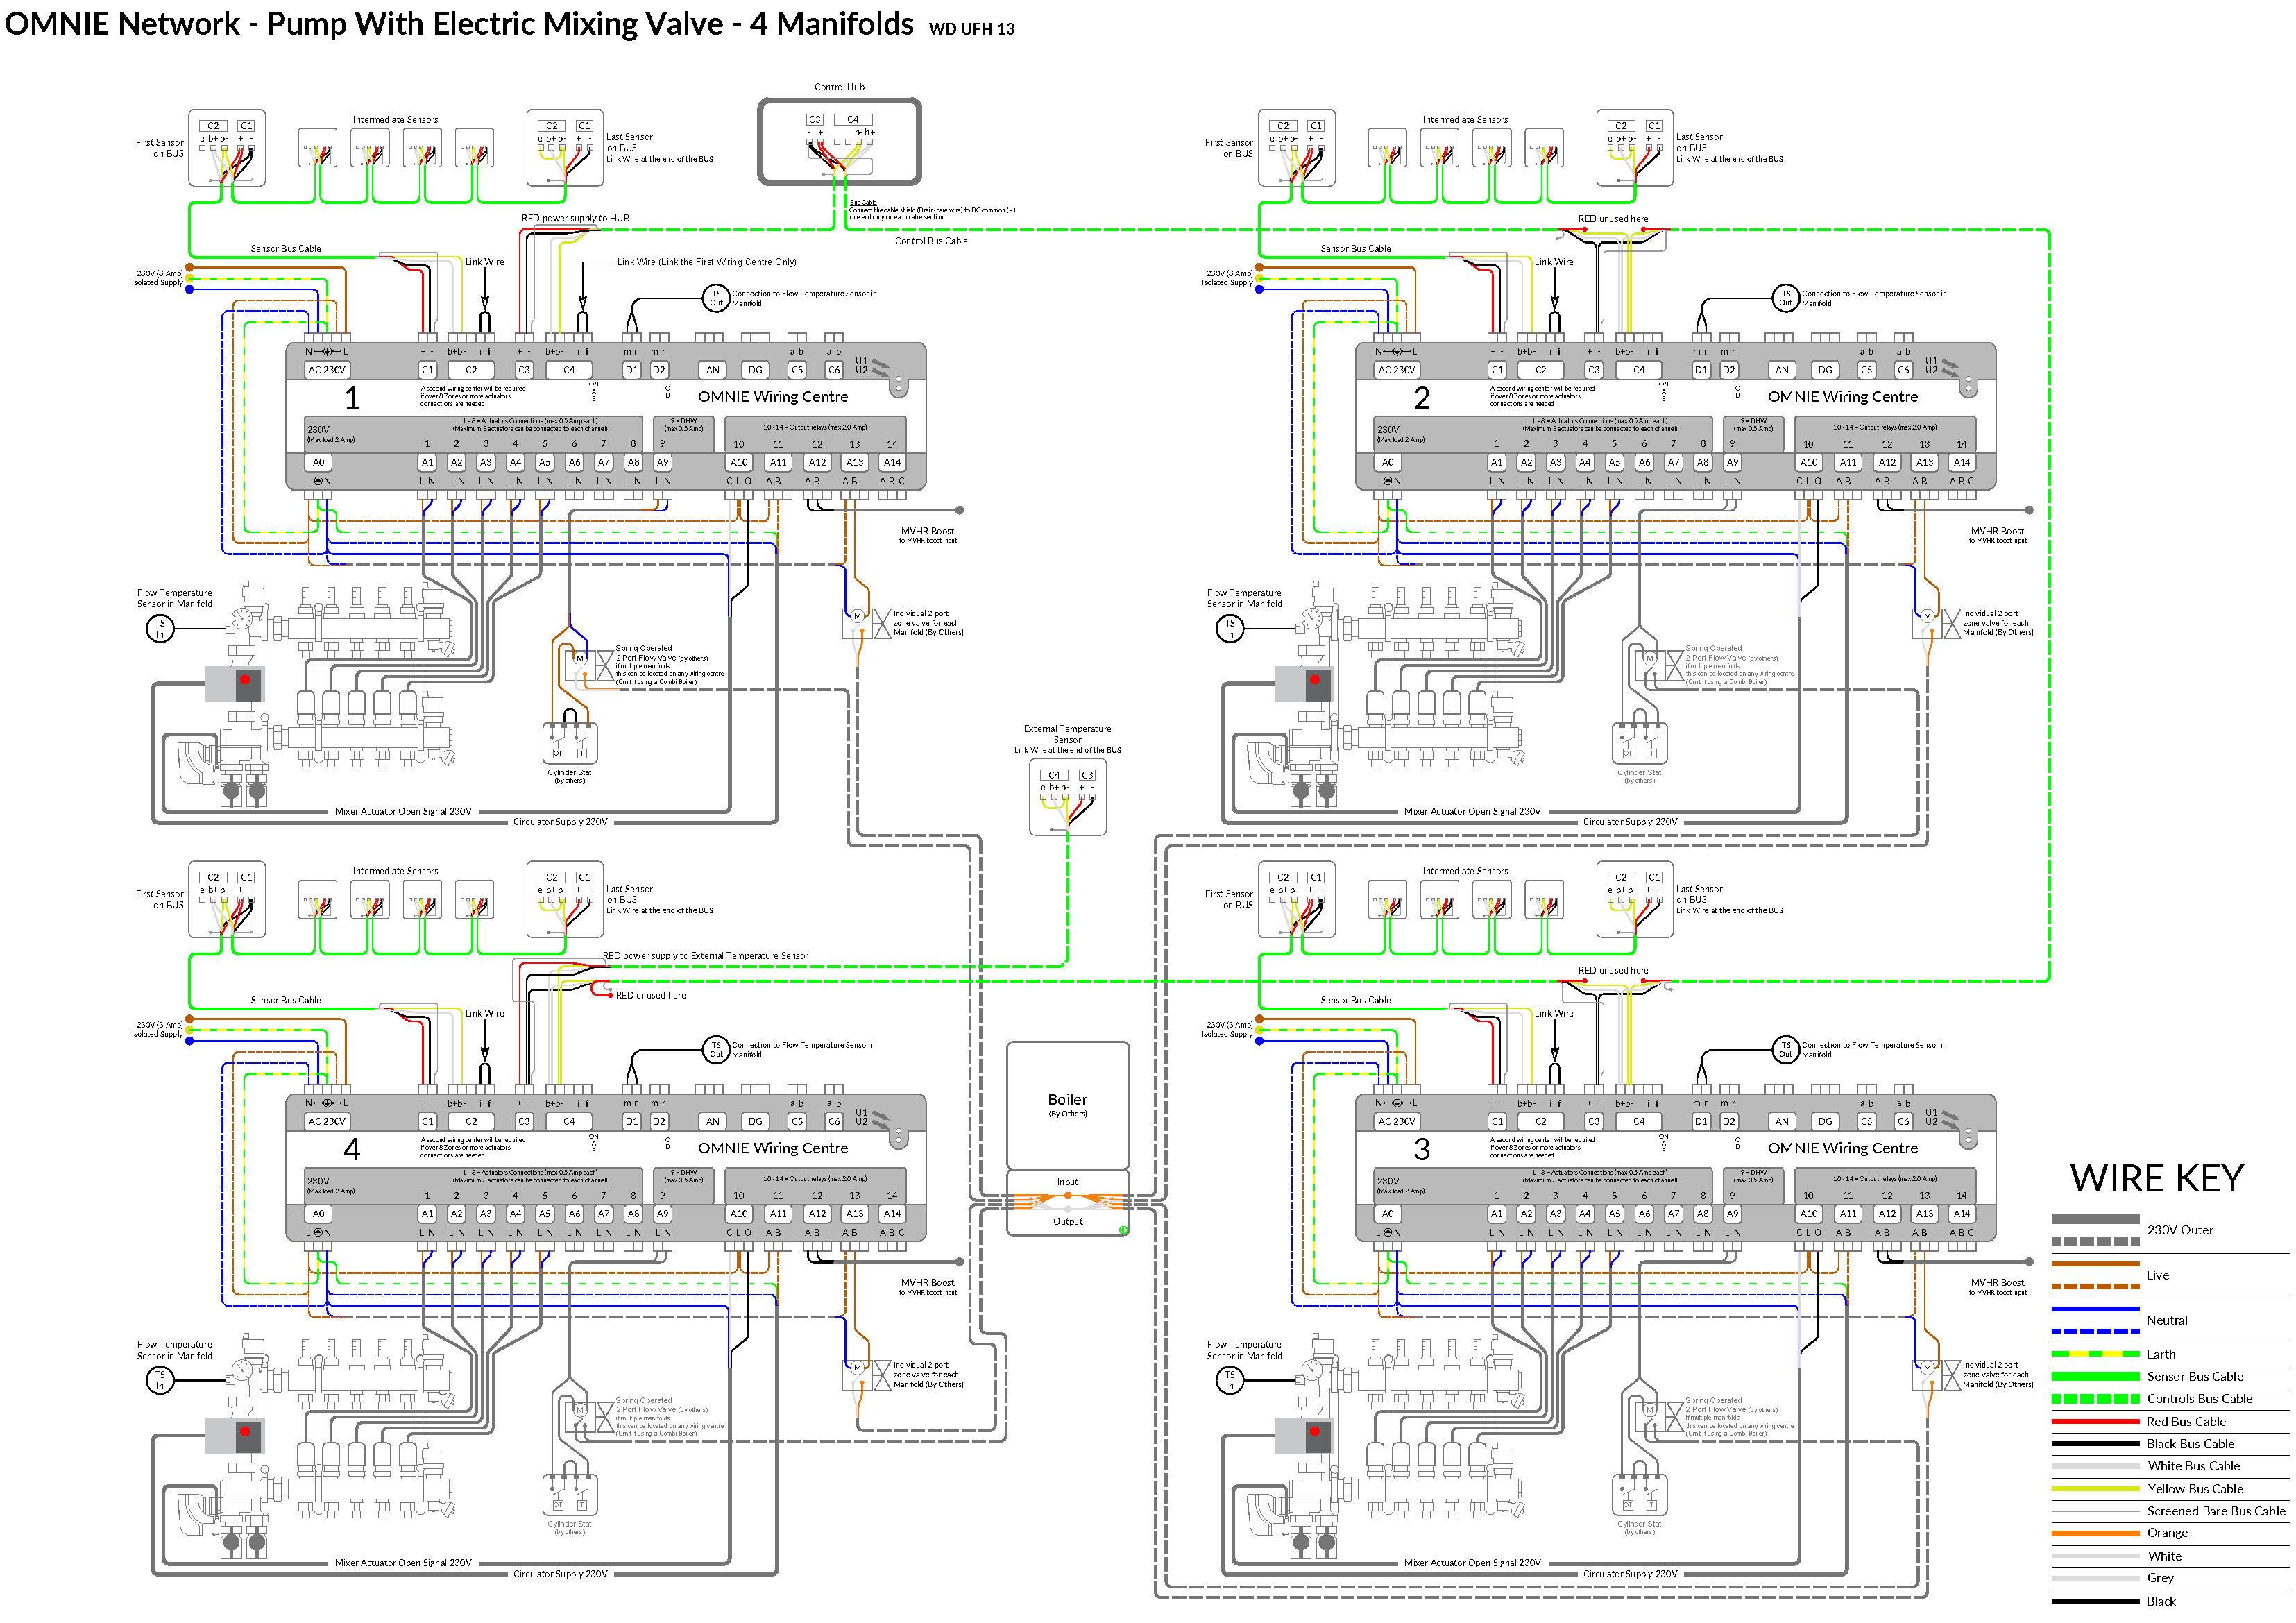 Rehau Underfloor Heating Wiring Diagram -2007 Chevy Impala Wiring Diagram    Begeboy Wiring Diagram Source   Rehau Underfloor Heating Wiring Diagram      Begeboy Wiring Diagram Source